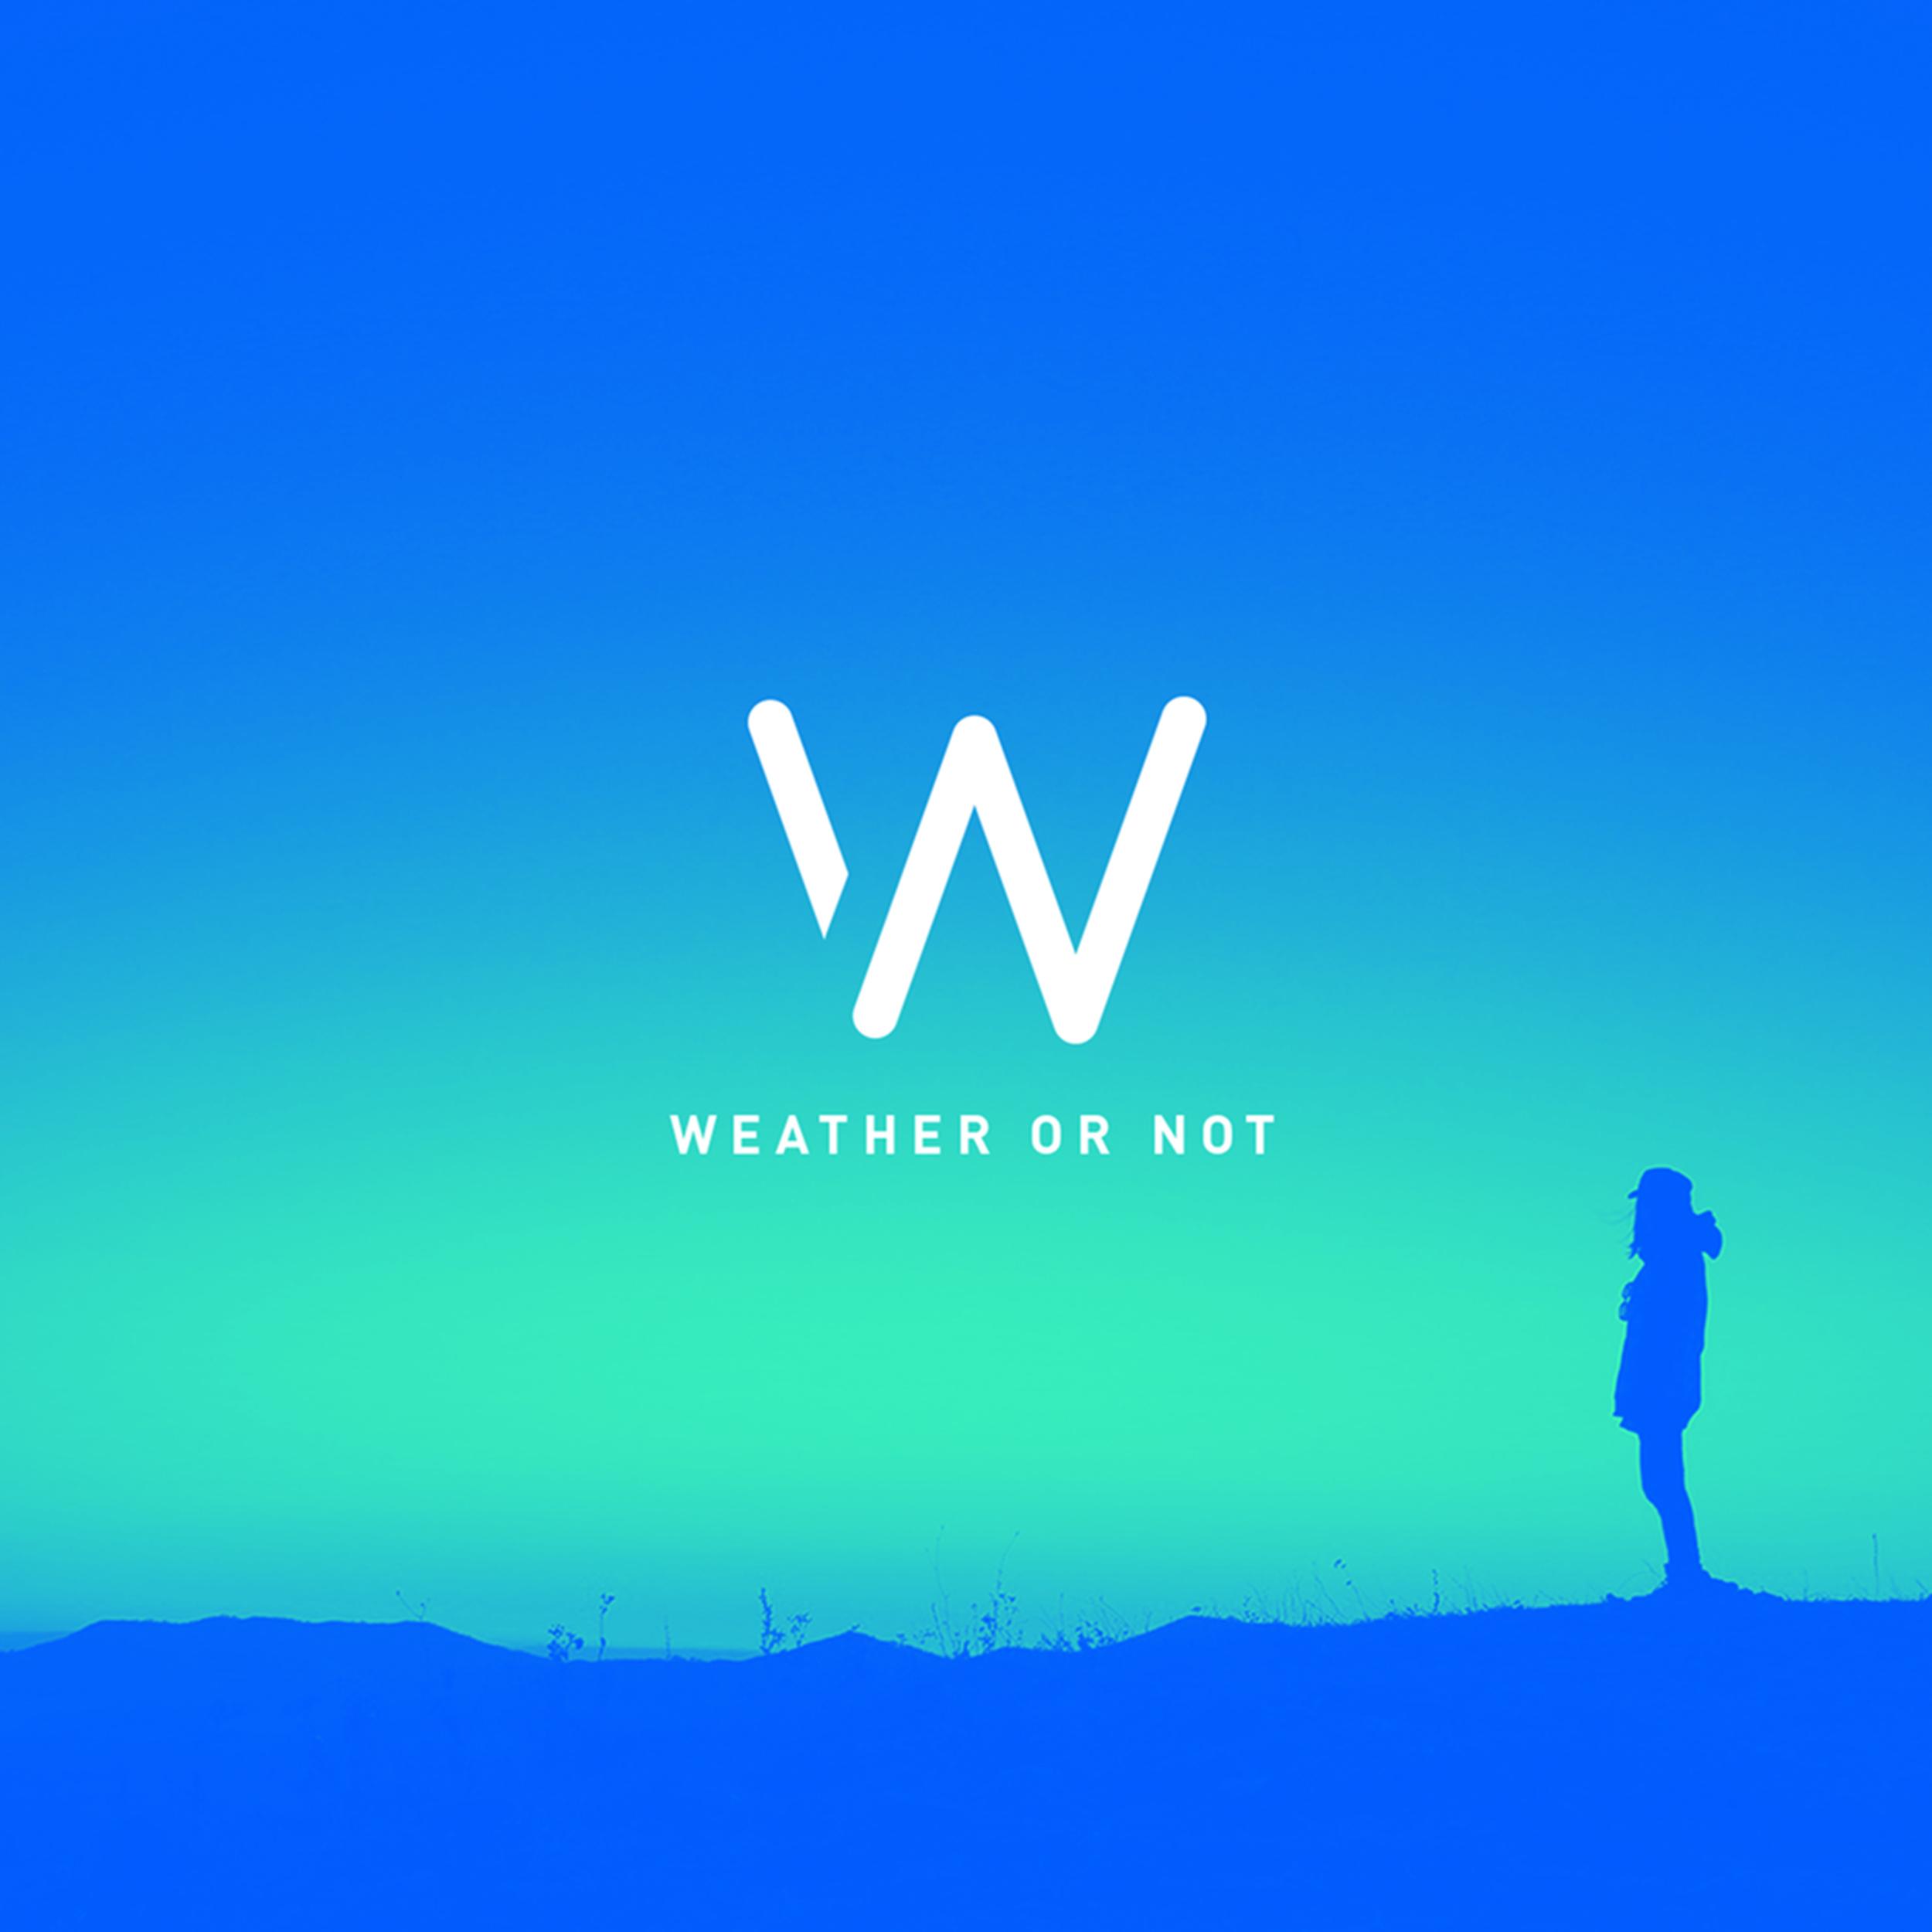 weatherornot2.png